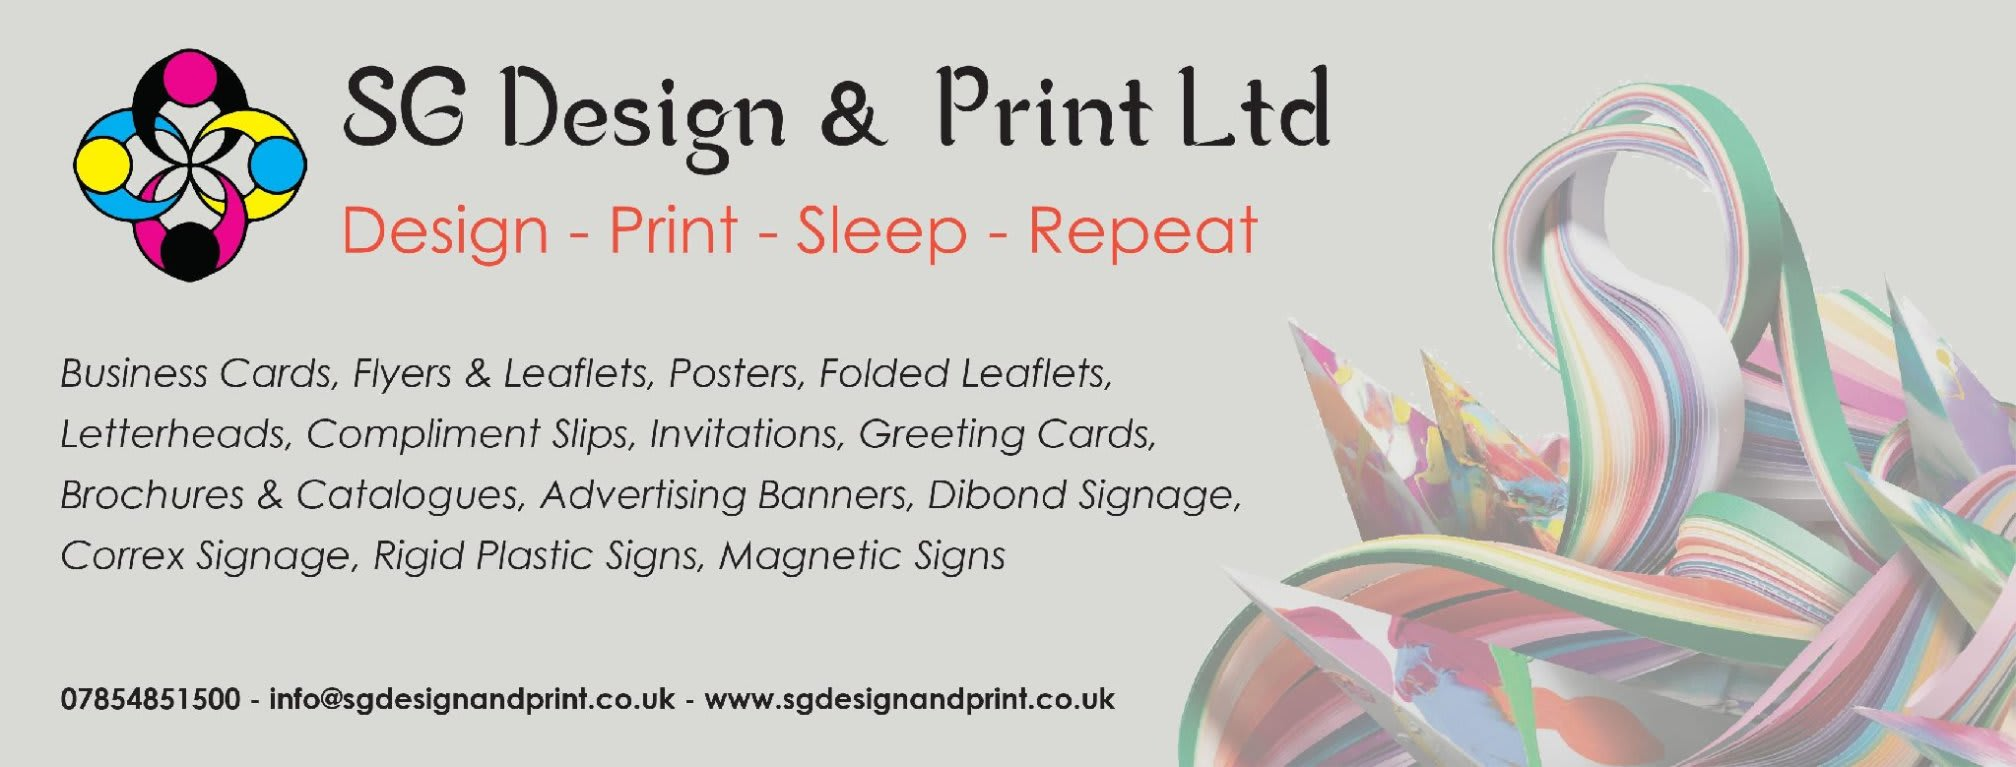 Sg design print ltd printers general in liverpool l37 8eg 192 sg design print ltd reheart Images